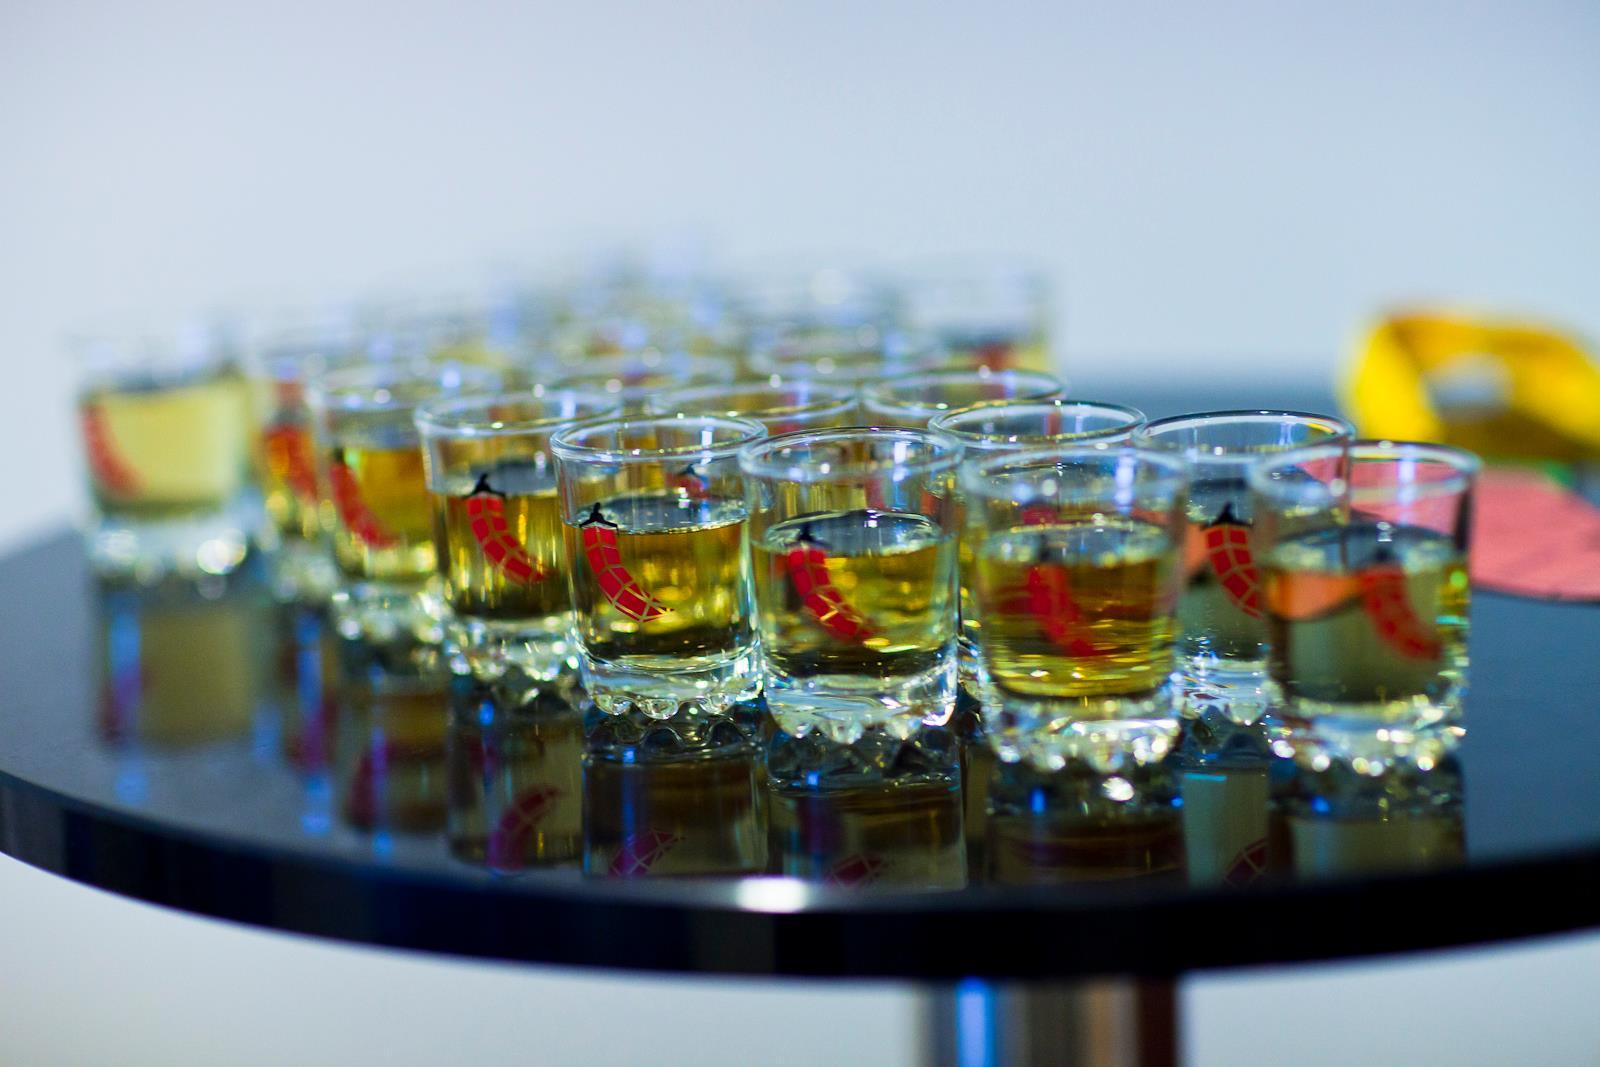 Лечение алкоголем при гриппе